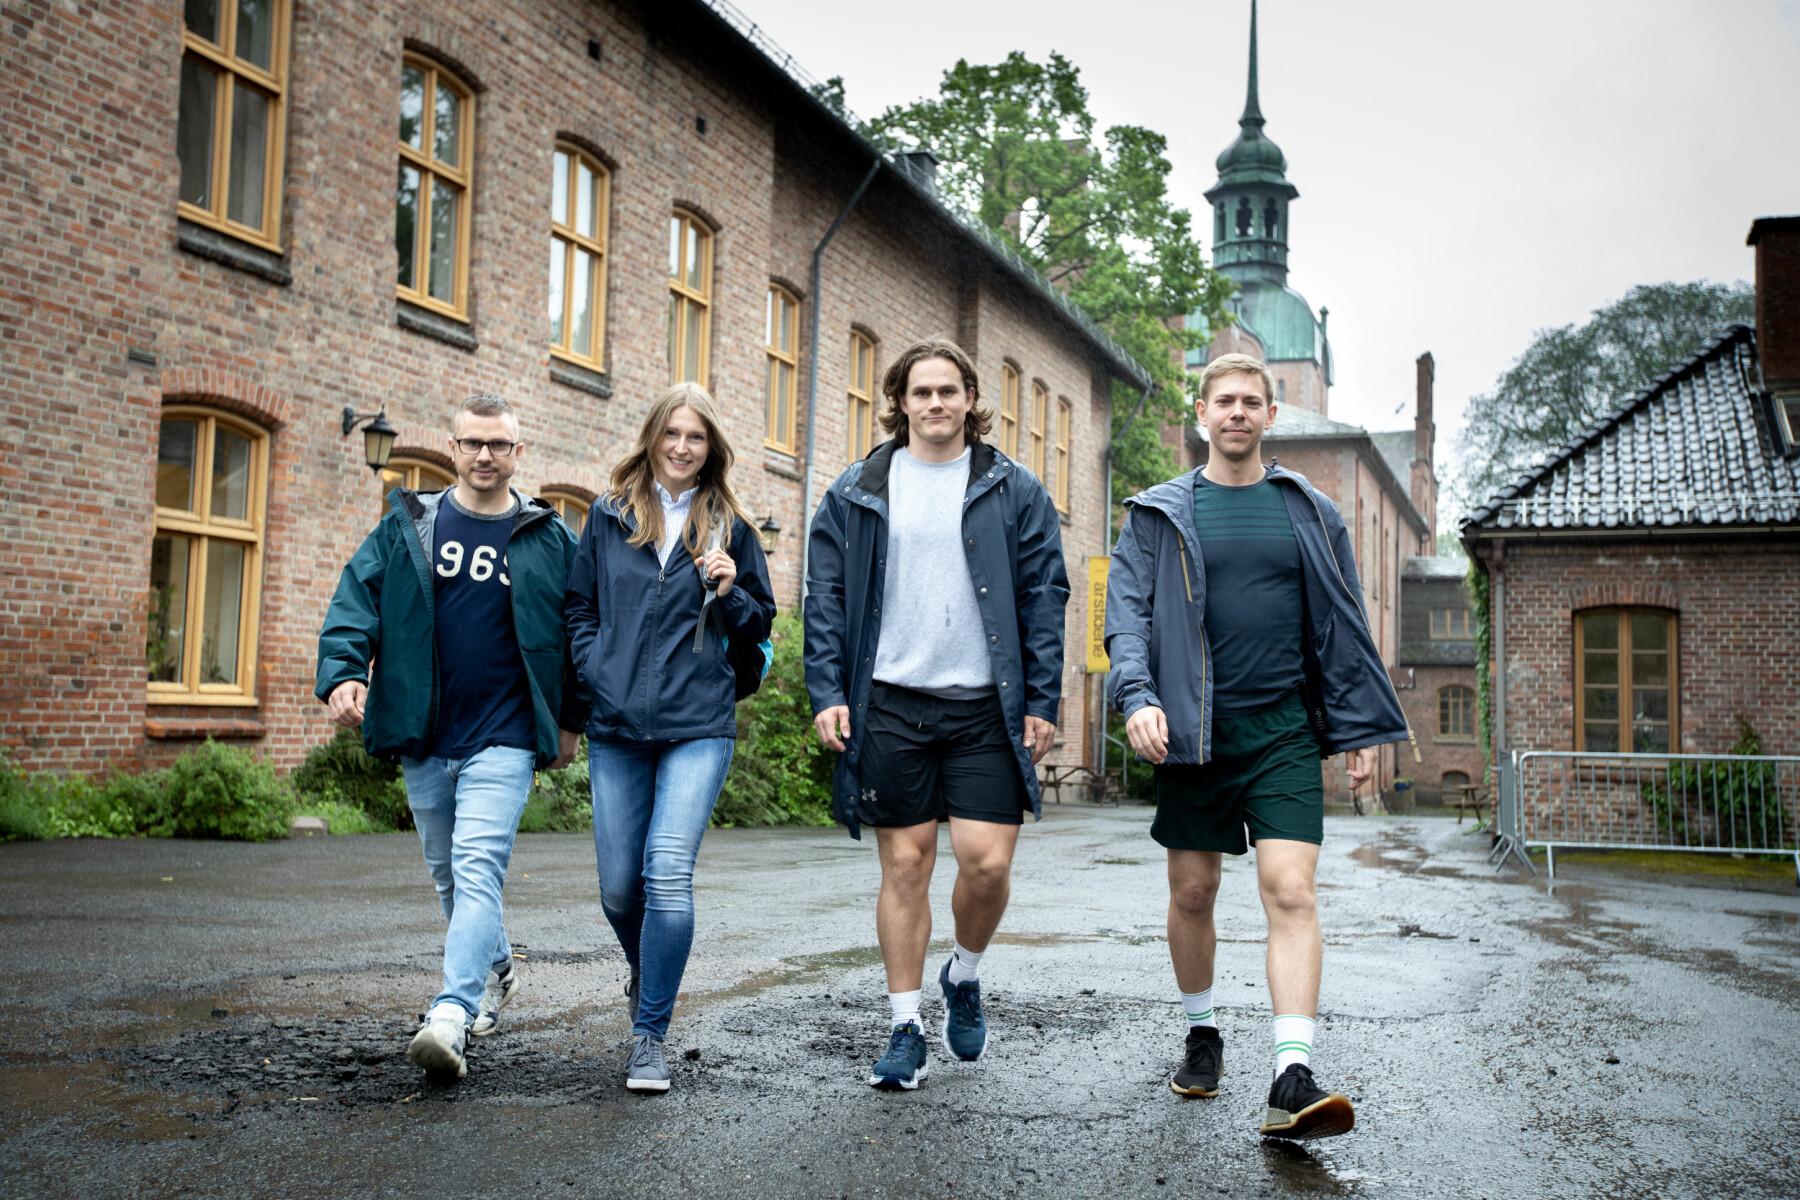 Fra venstre Daniel Ferretti, Katarzyna Dabrowska, Are Weidemann og Helge Haugdal.